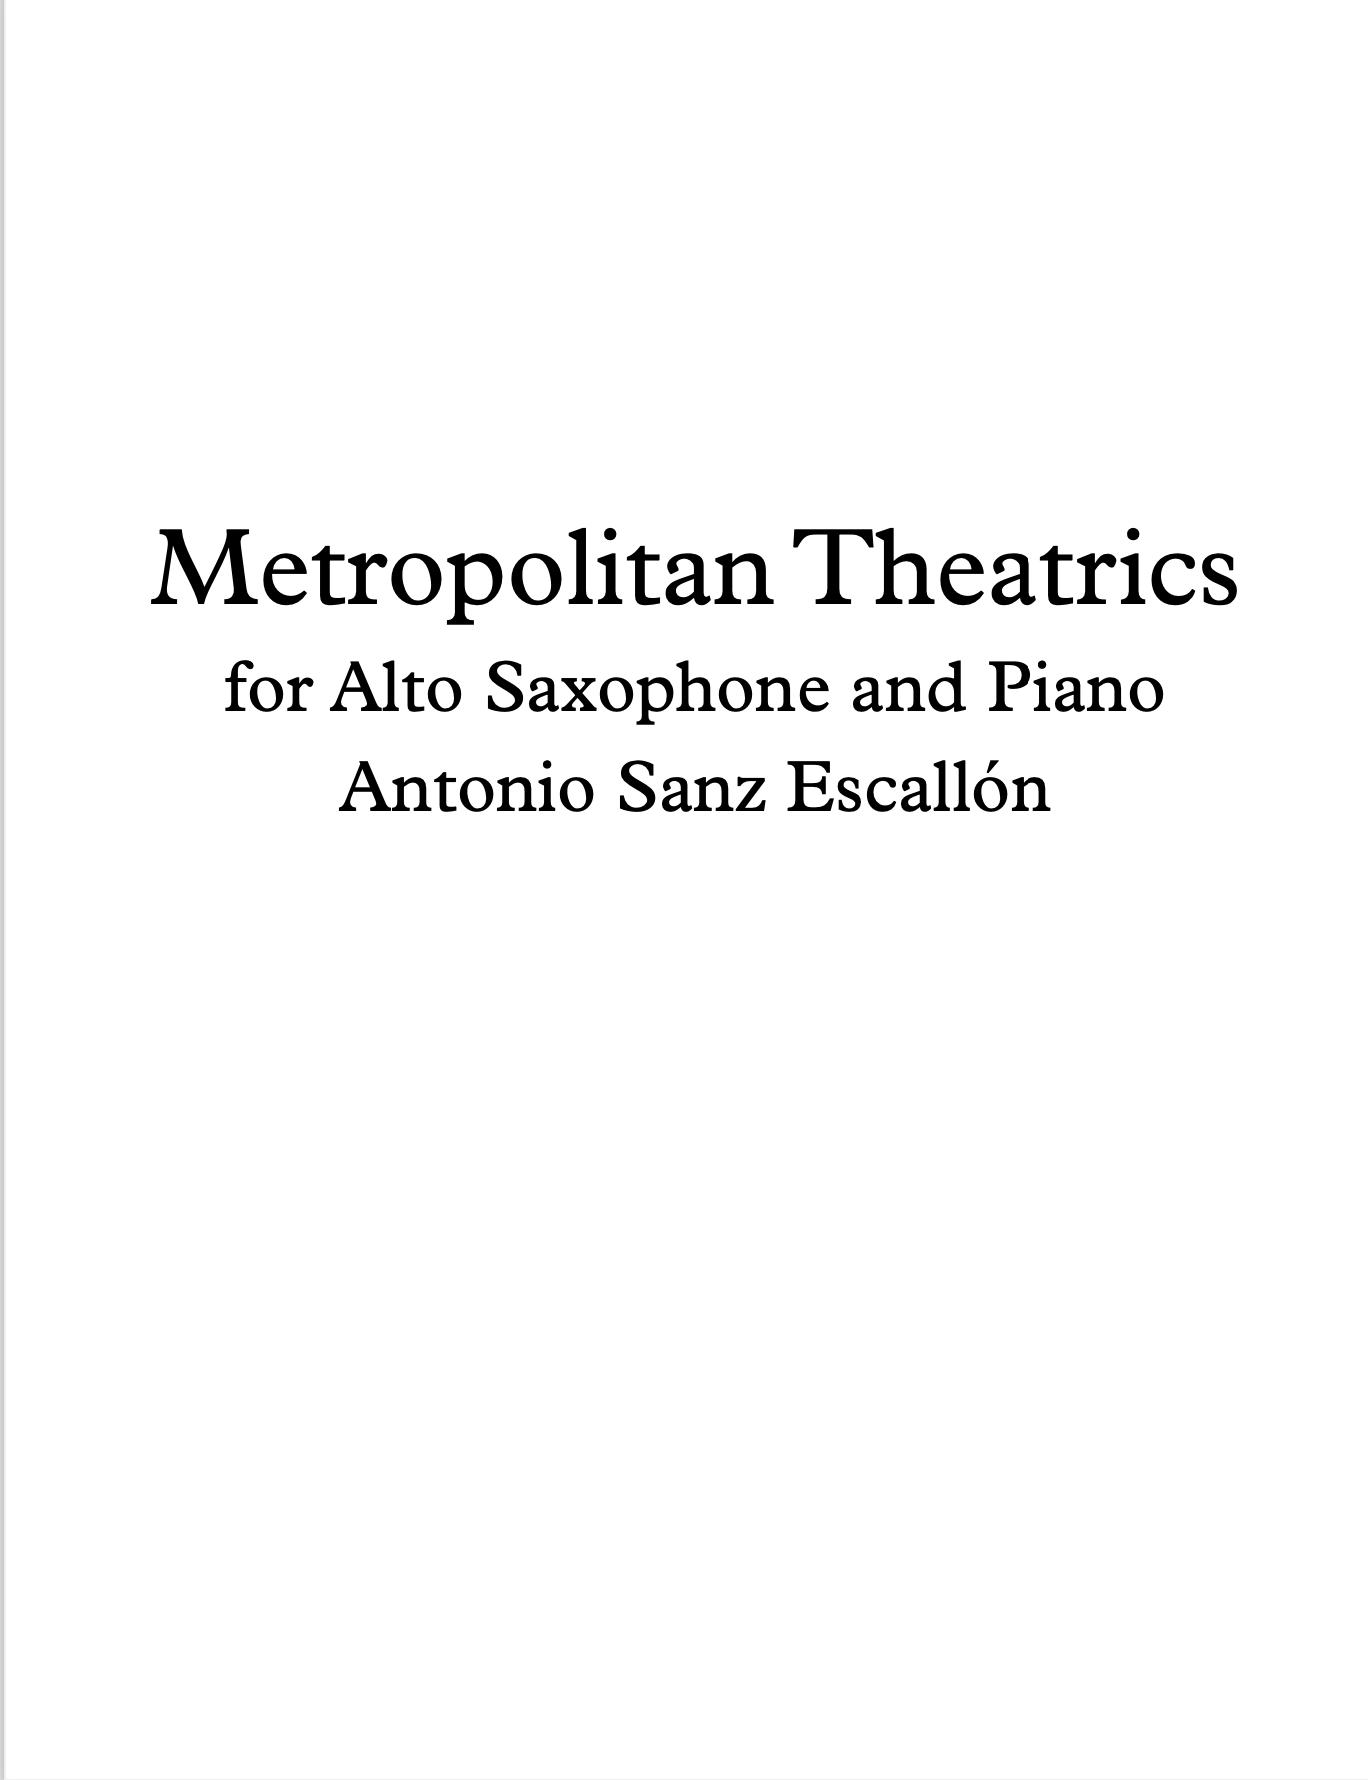 Metropolitan Theatrics by Antonio Sanz Escallón